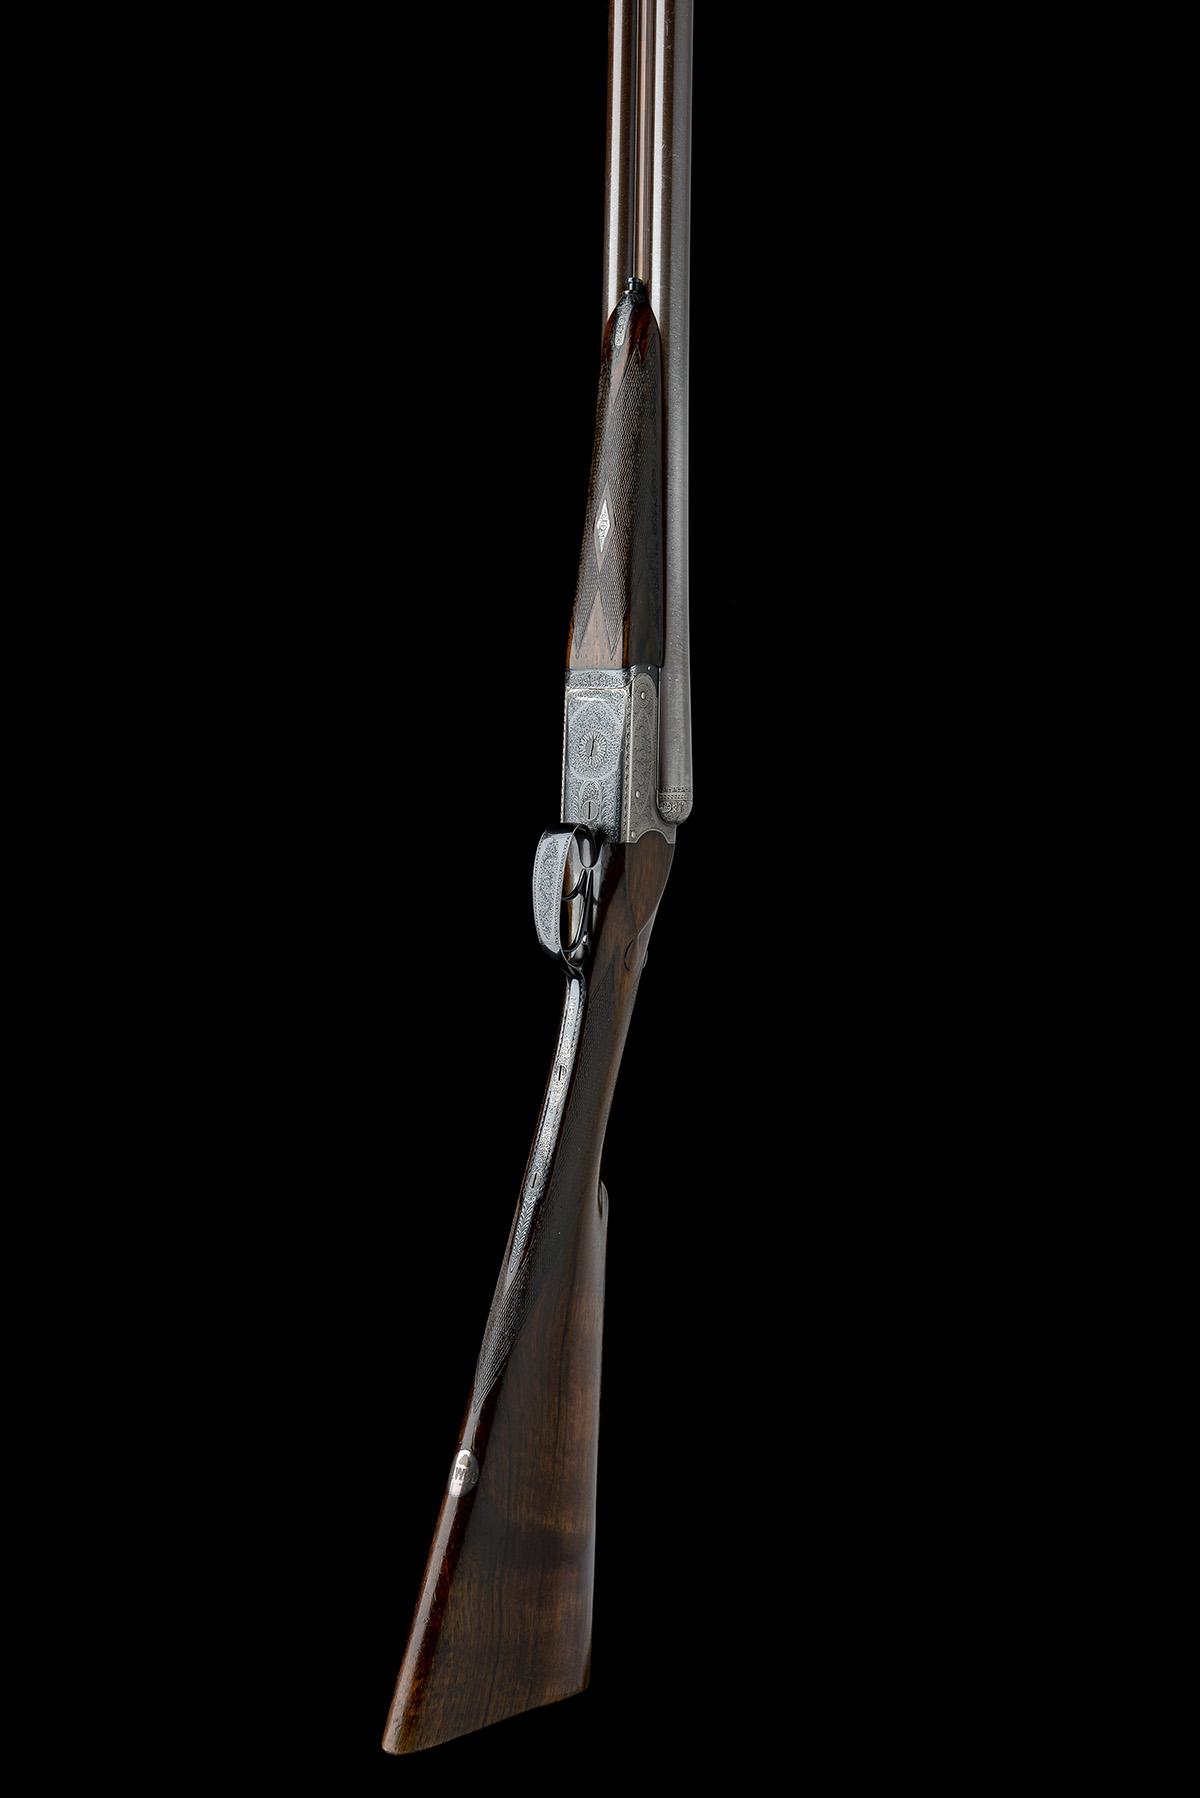 ROWLAND WATSON A 12-BORE BOXLOCK EJECTOR, serial no. 19742, circa 1938, 30in. nitro damascus - Image 8 of 8